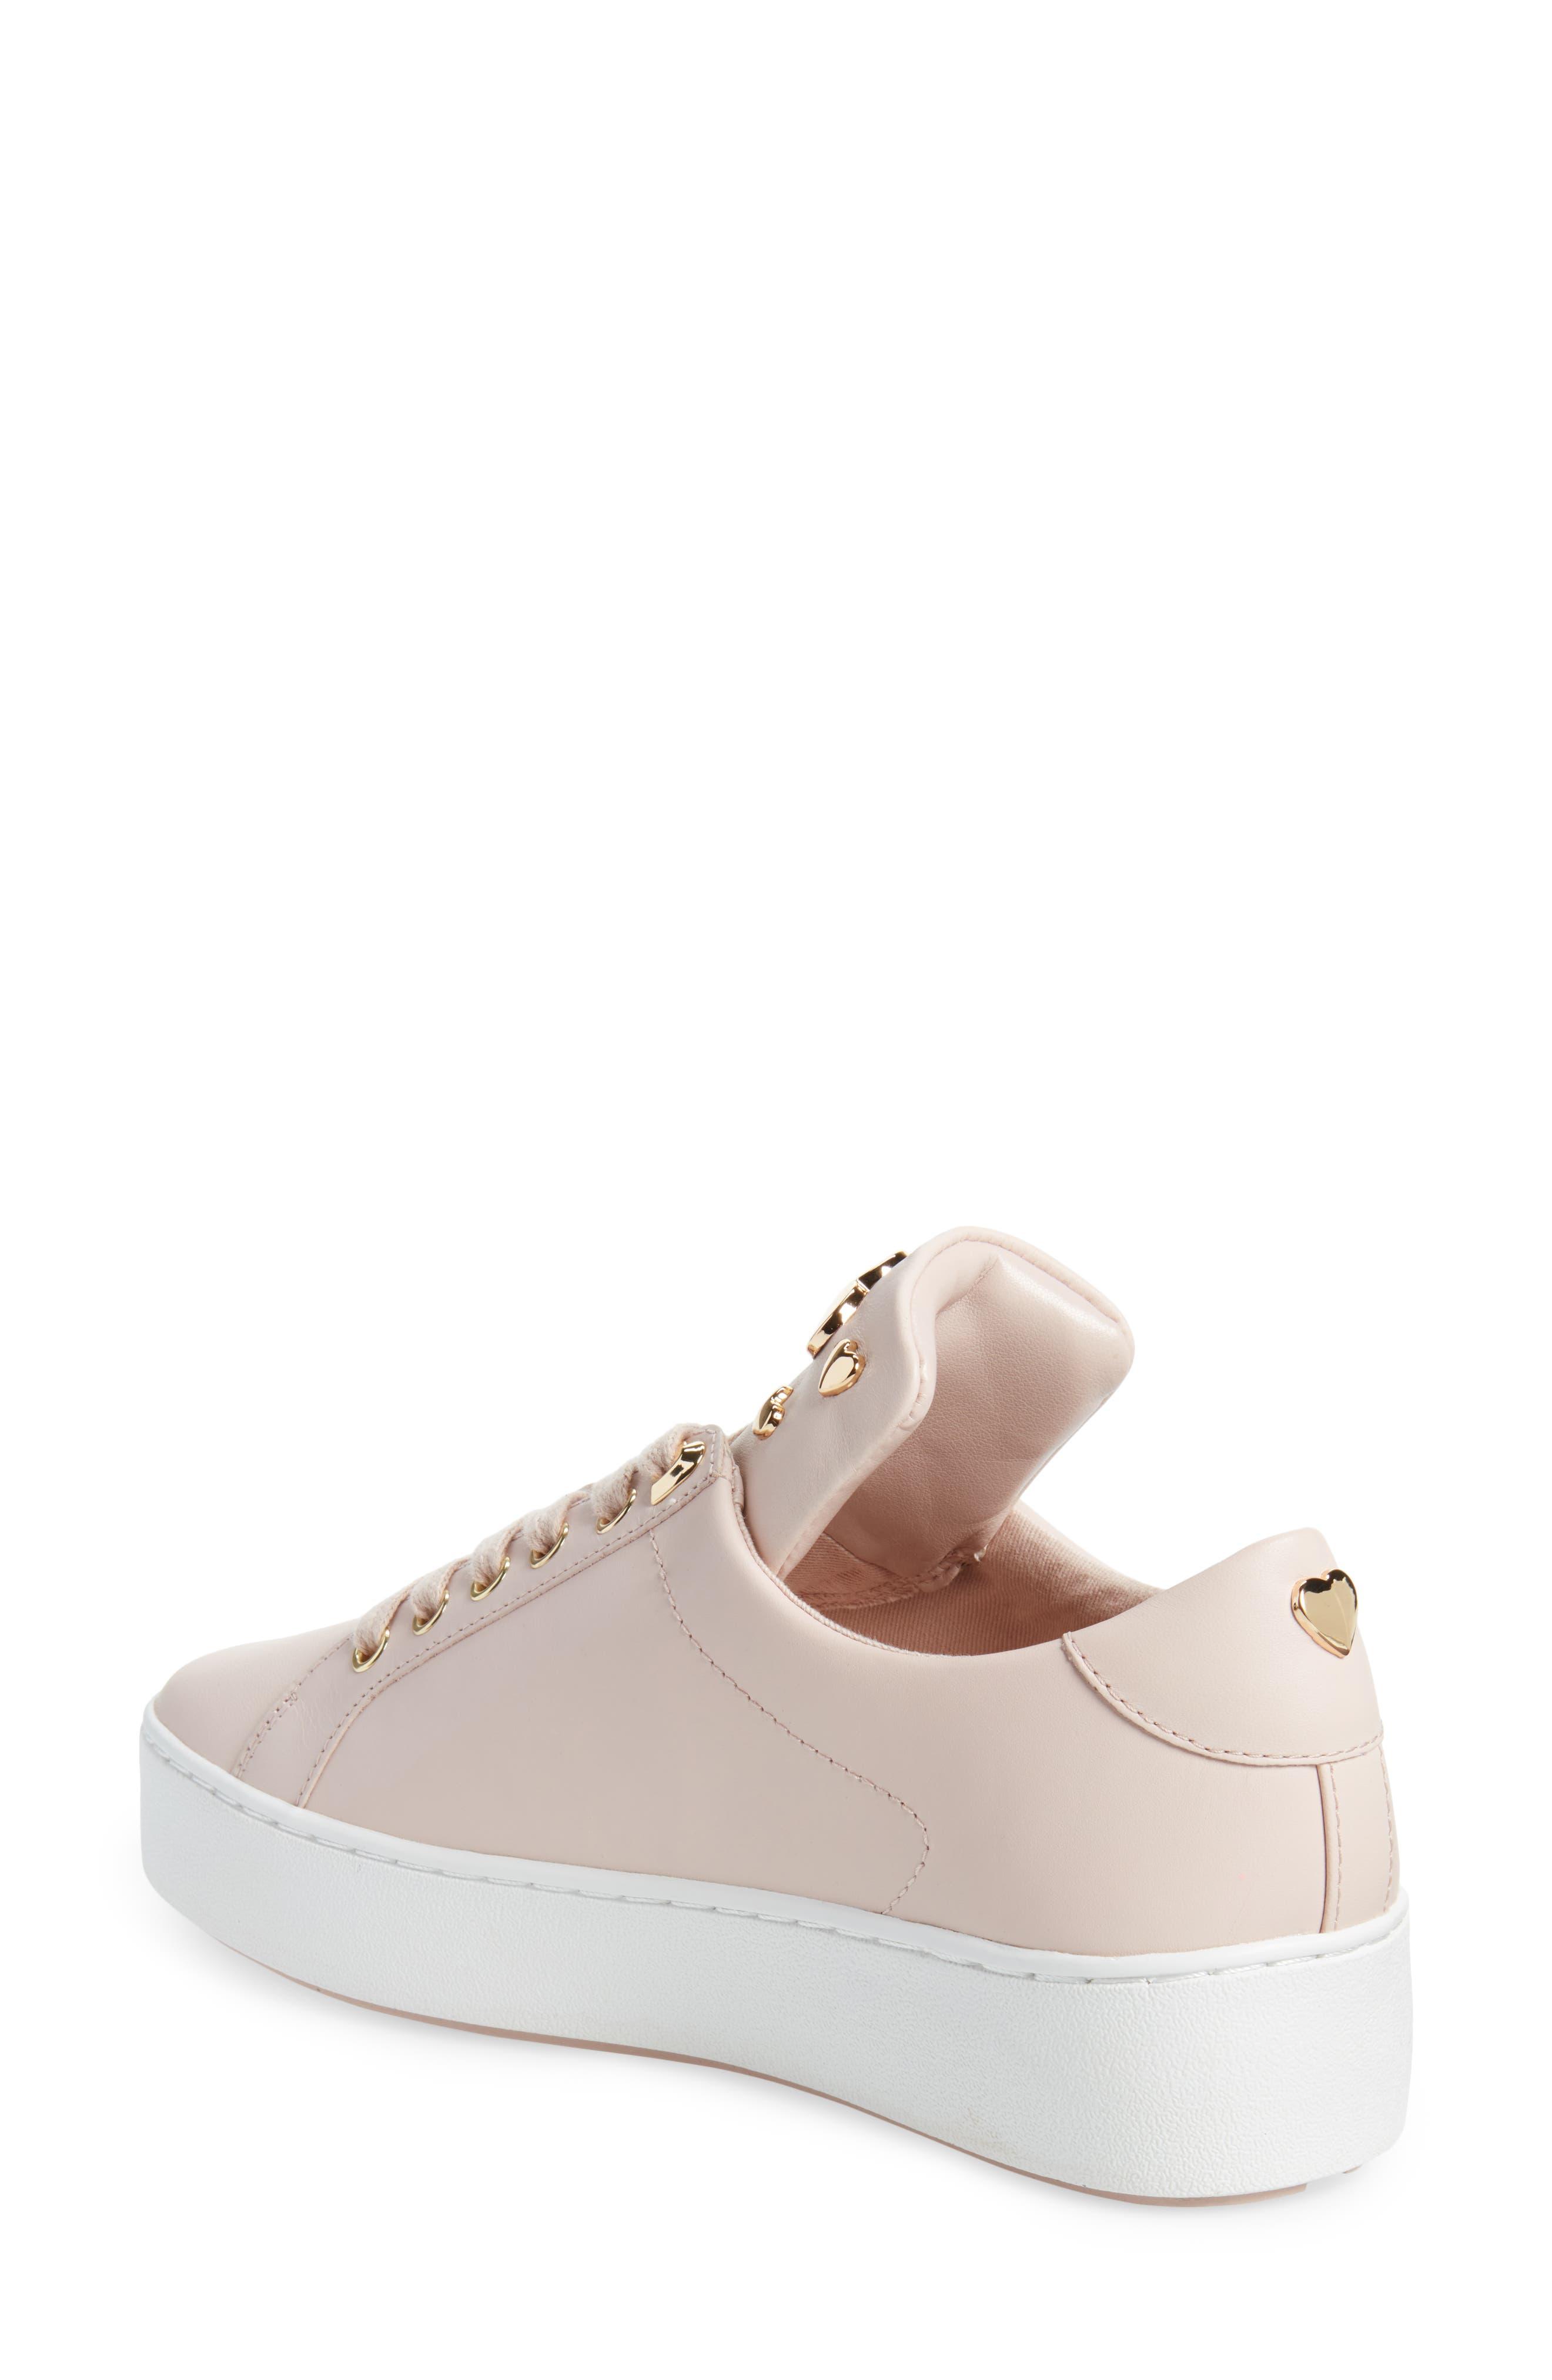 Mindy Platform Sneaker,                             Alternate thumbnail 2, color,                             Soft Pink Studs